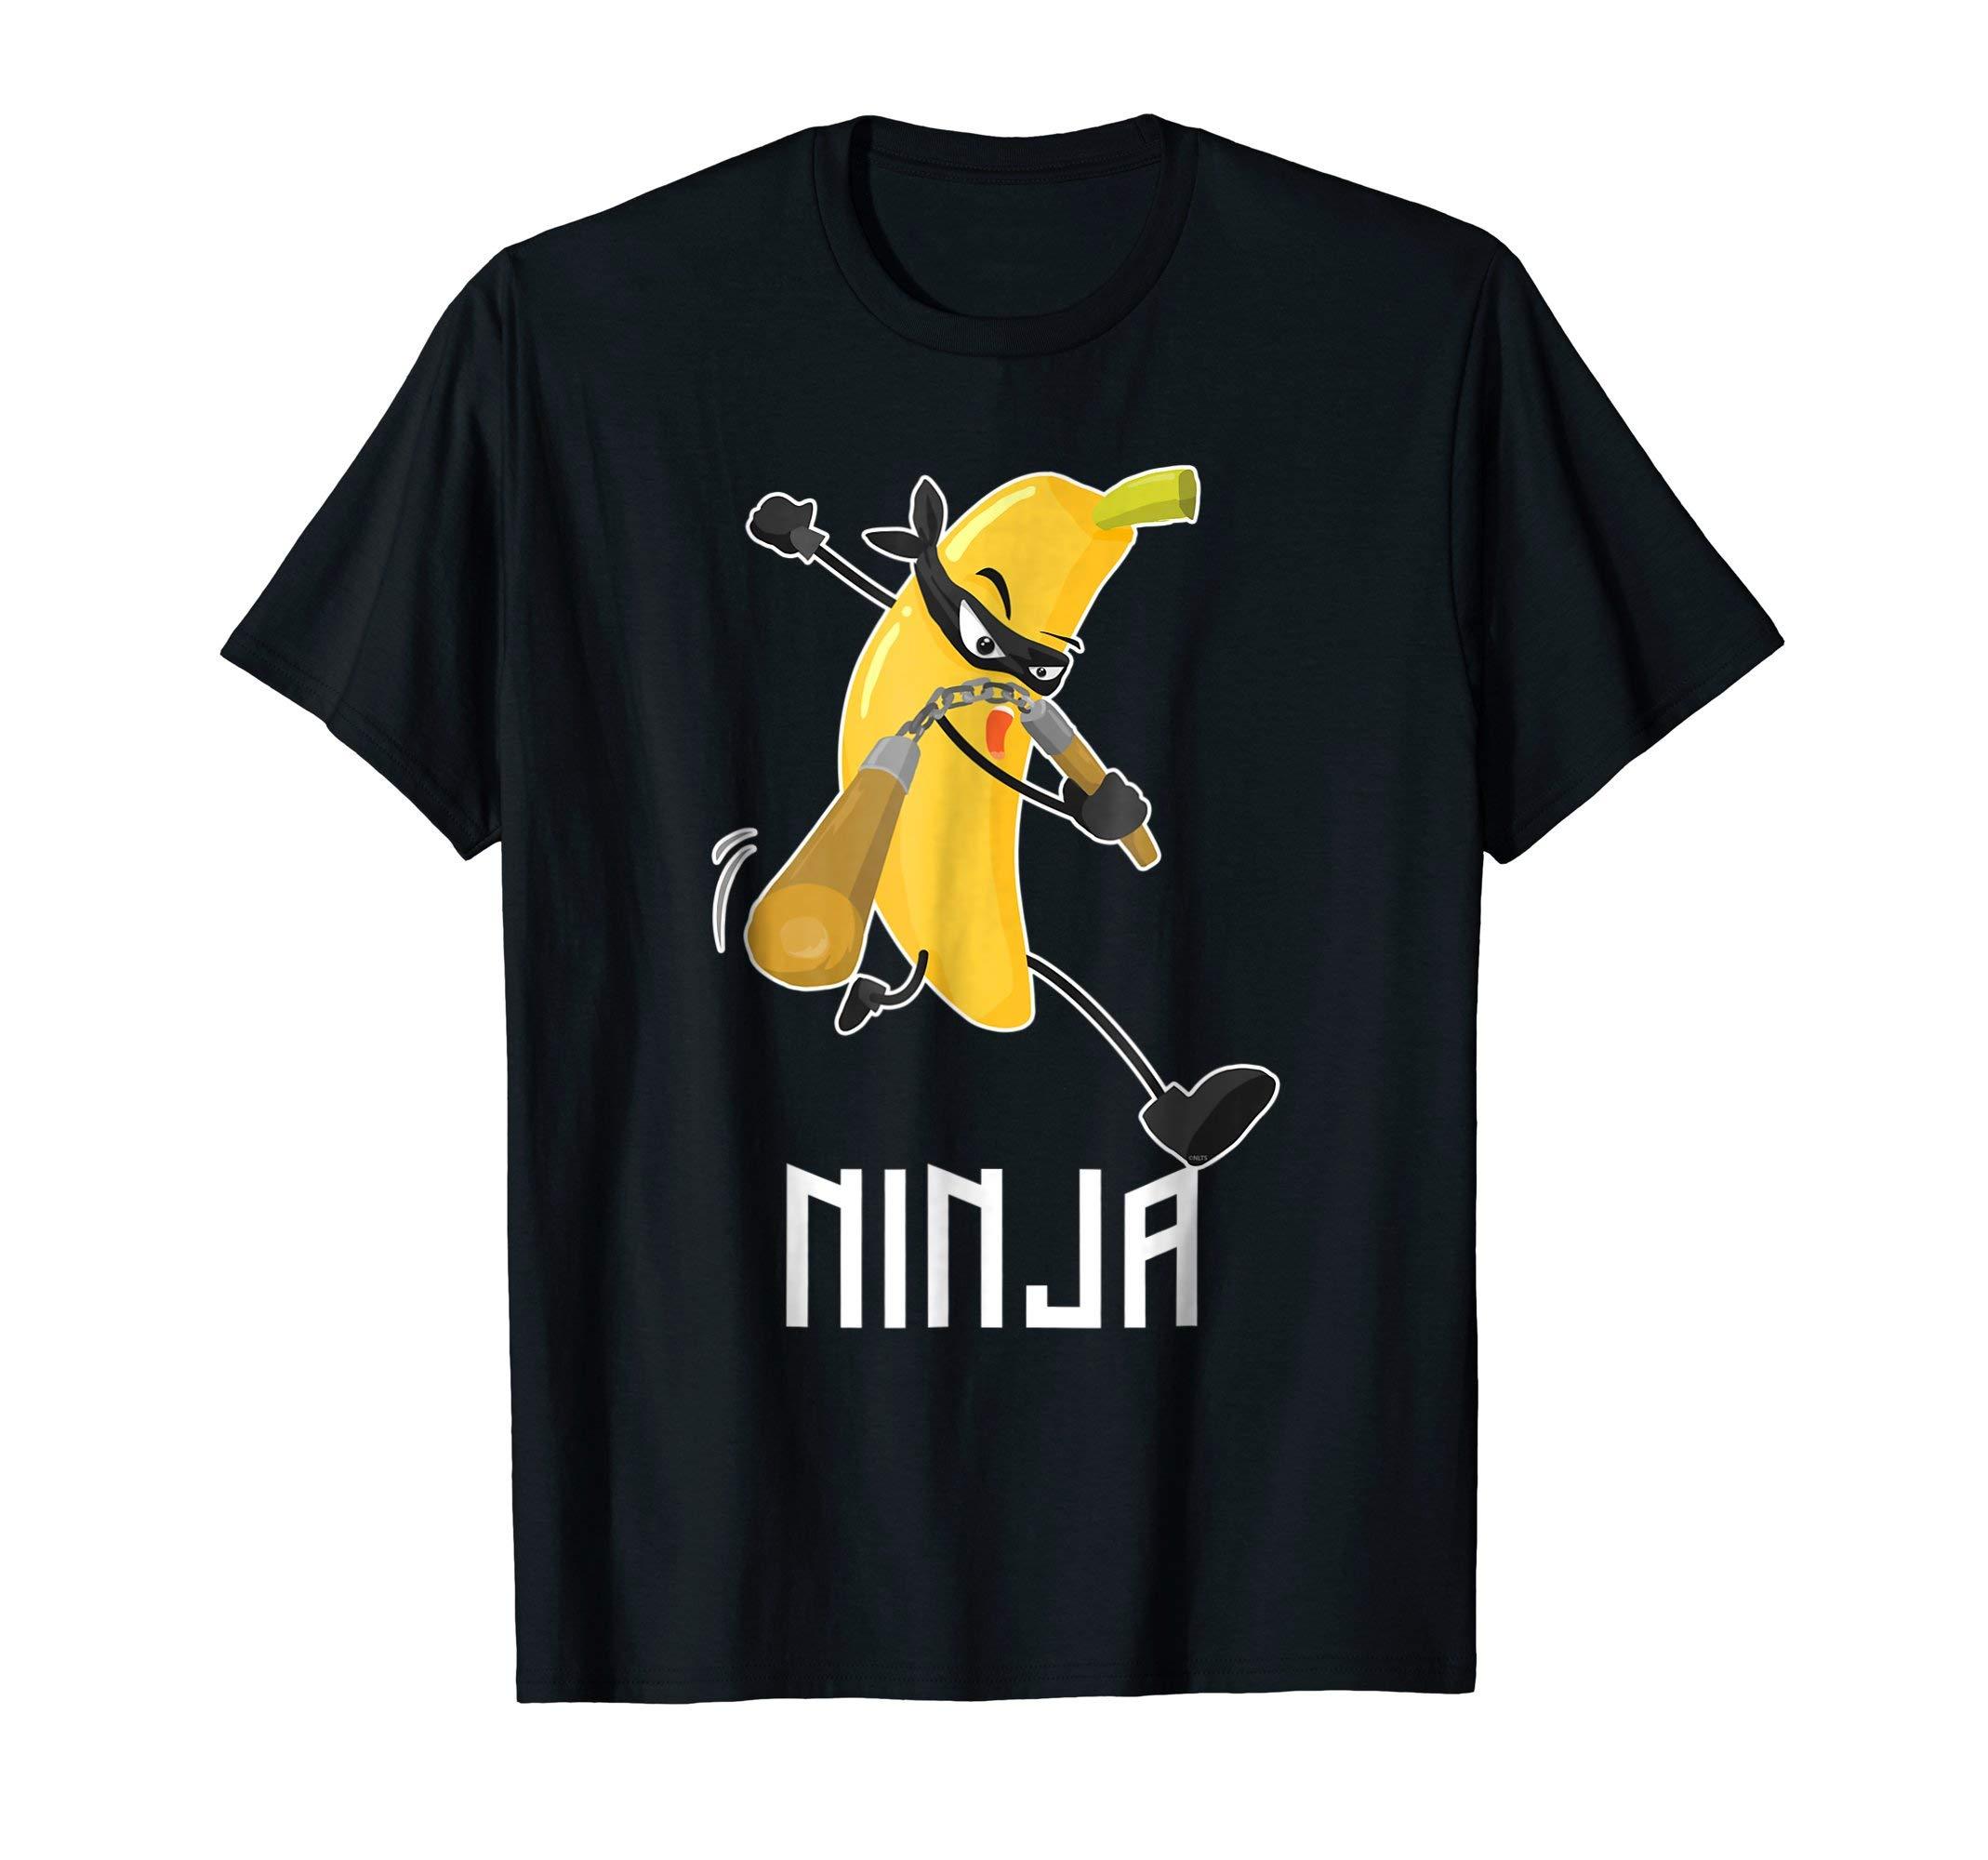 Banana-Ninja-Warrior-Attack-T-Shirt-Tee-Shirt-Gifts